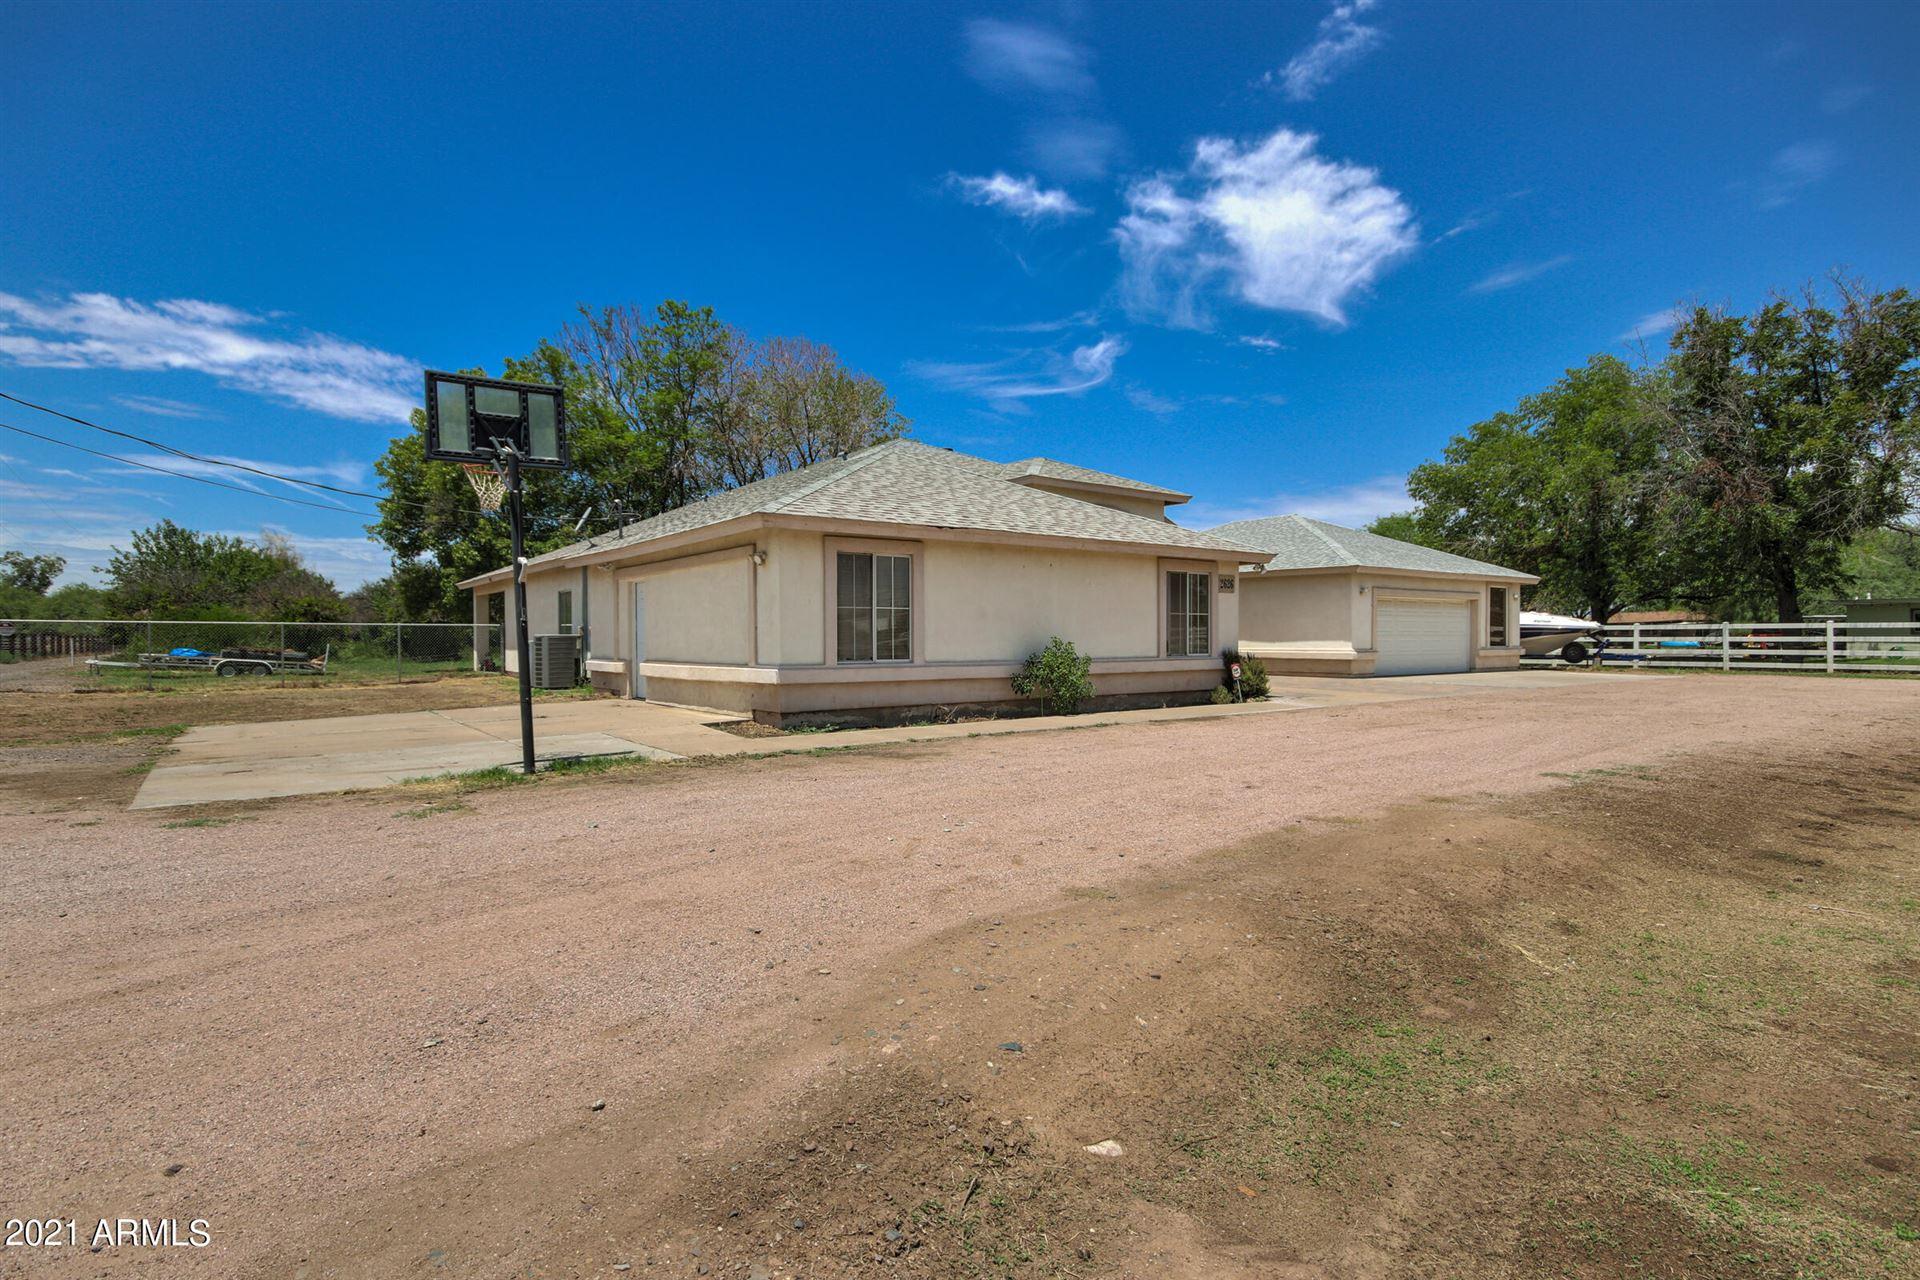 Photo of 2626 N HORNE --, Mesa, AZ 85203 (MLS # 6269349)